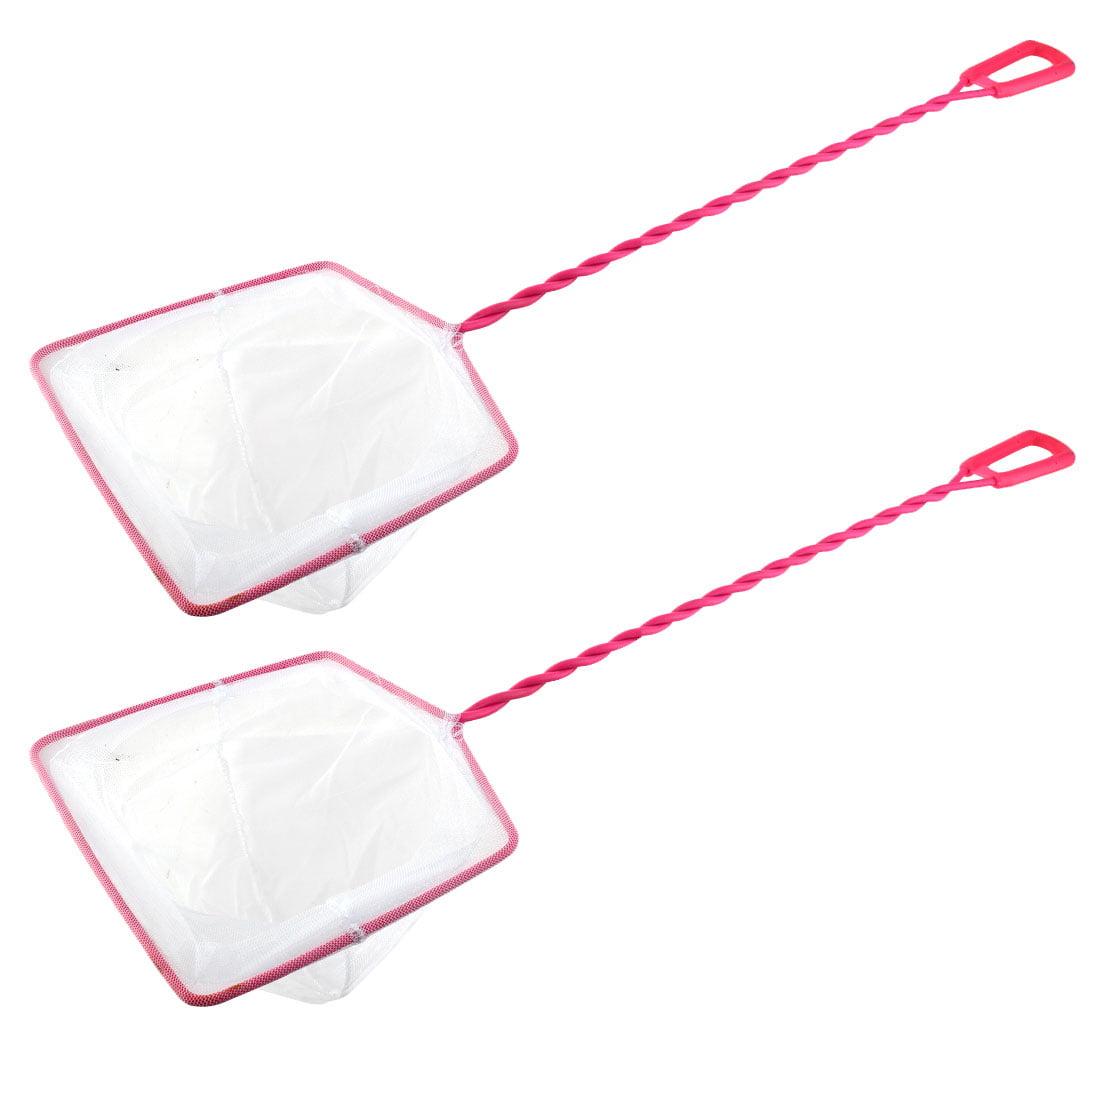 2Pcs Pink Plastic Coated Handle Square Frame Aquarium Pond Fish Skimming Net